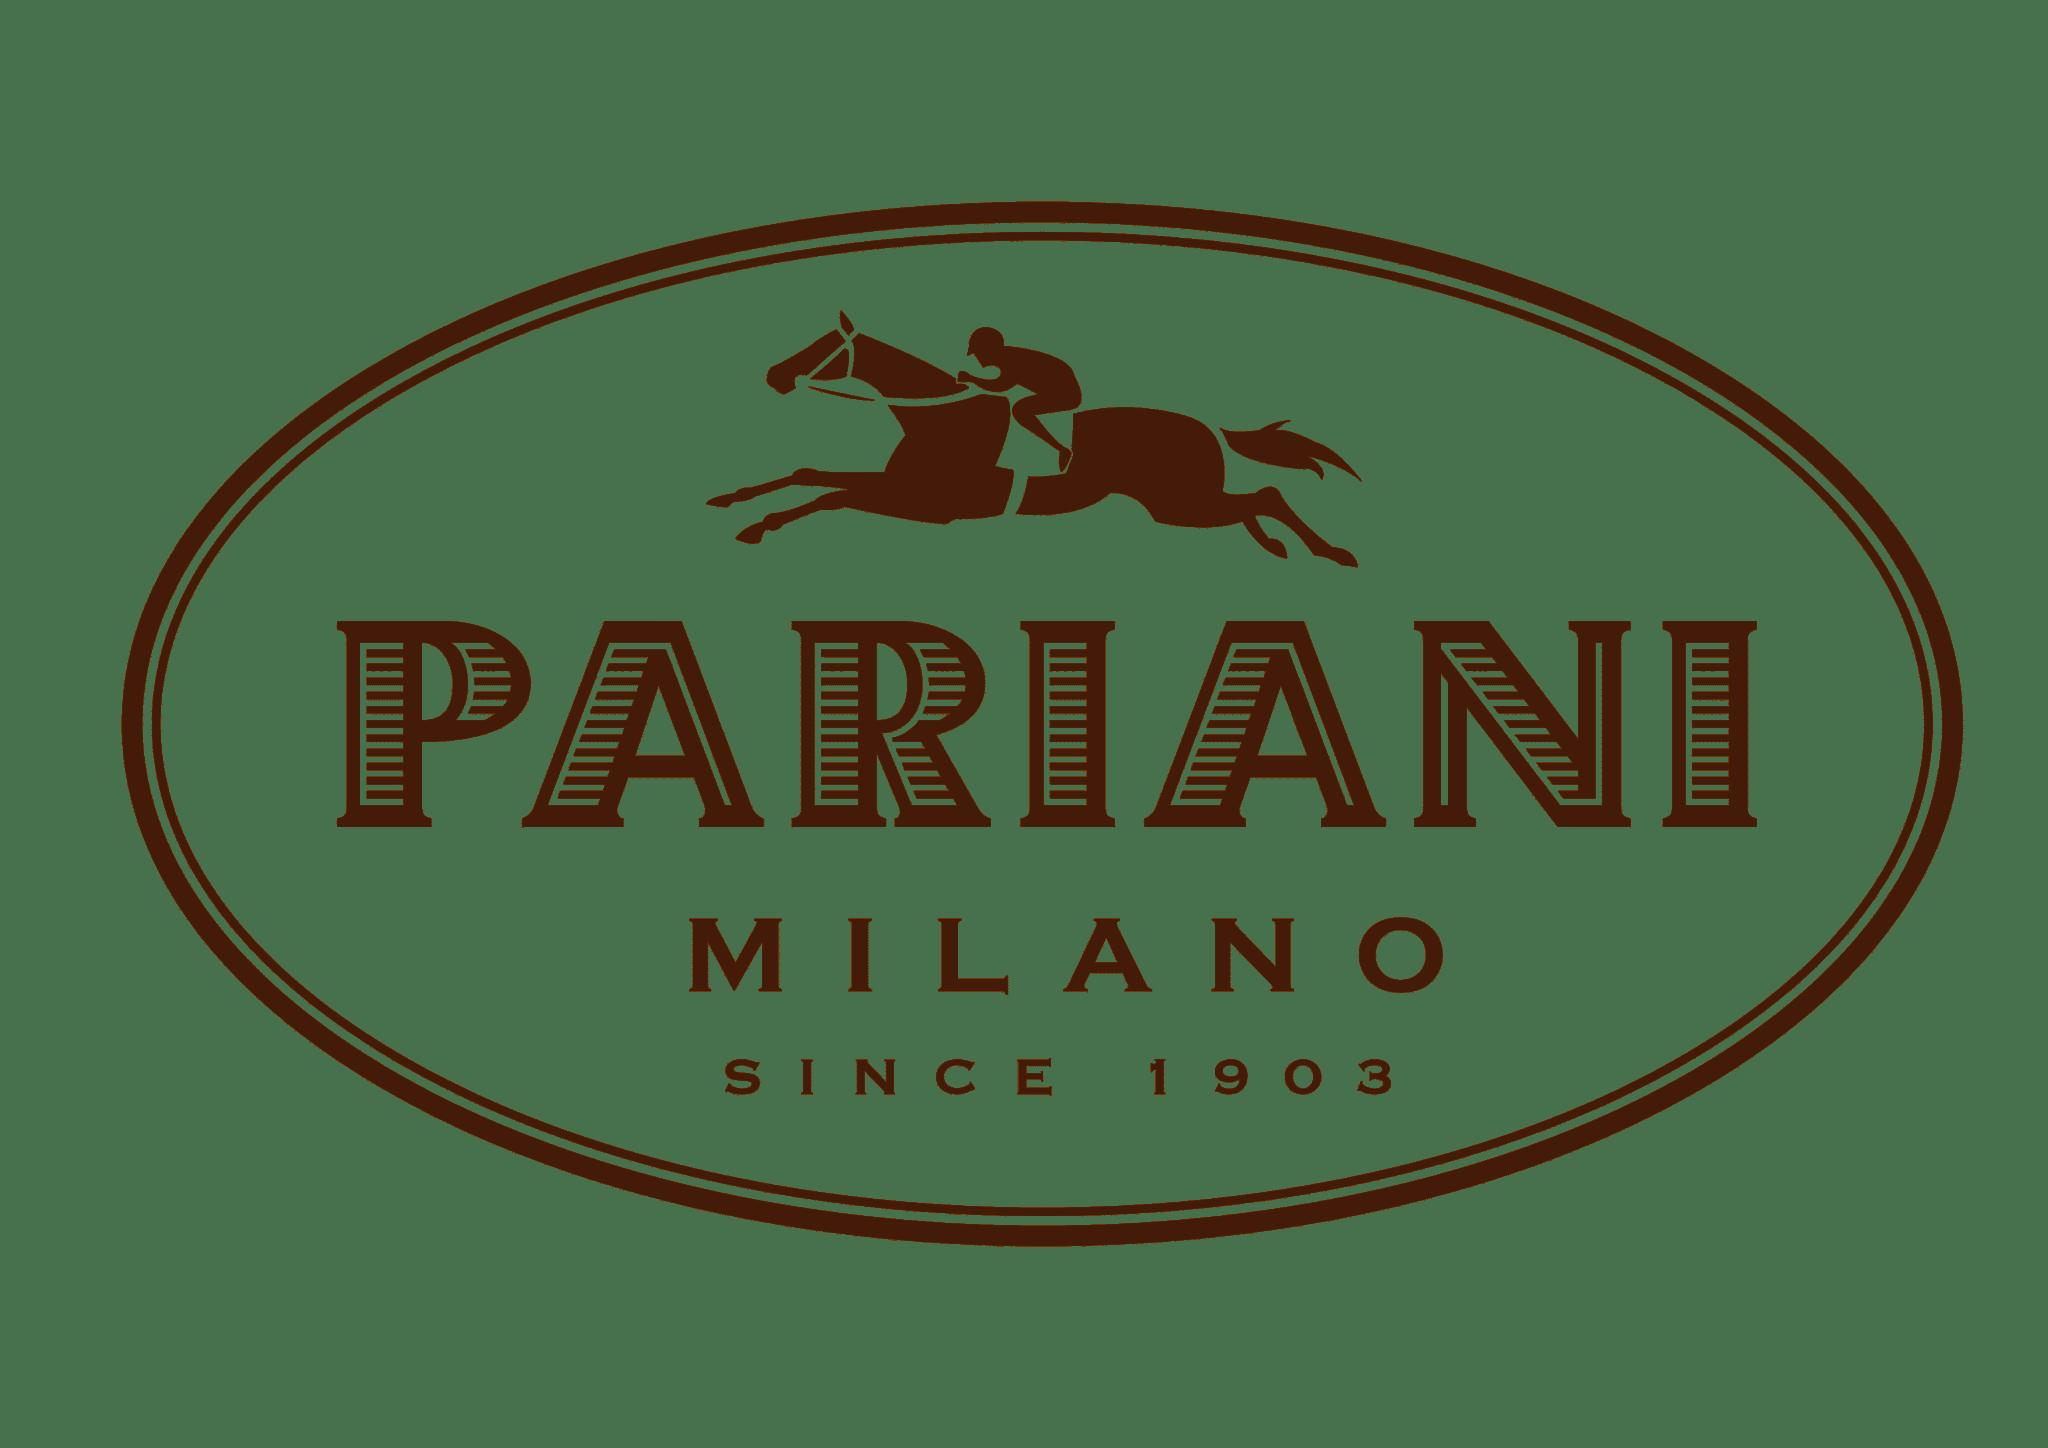 Storia partnership fra Selleria Pariani e Umbria Equitazione